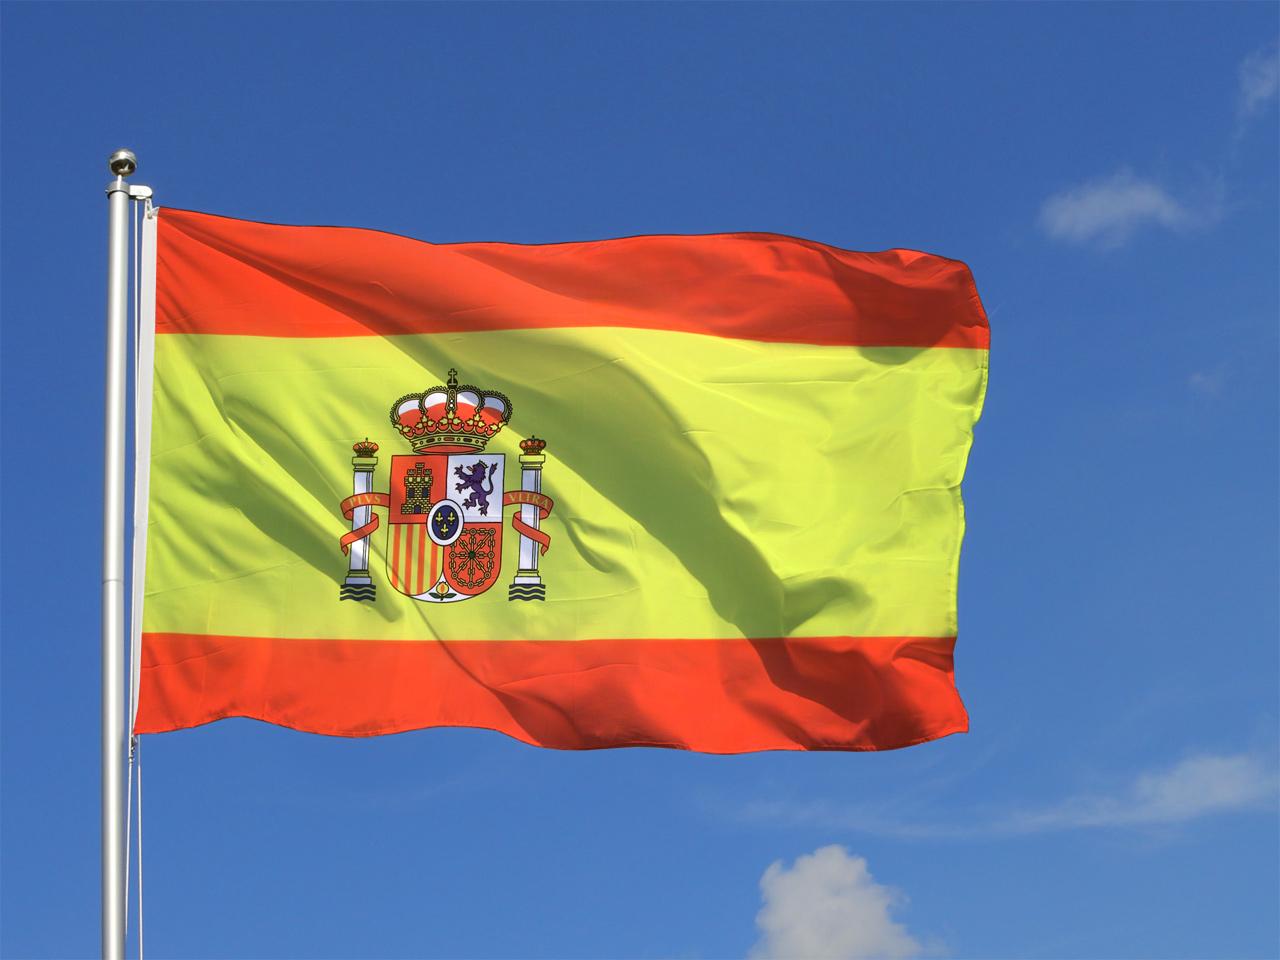 Coloriage drapeau espagne imprimer - Image drapeau espagnol a imprimer ...